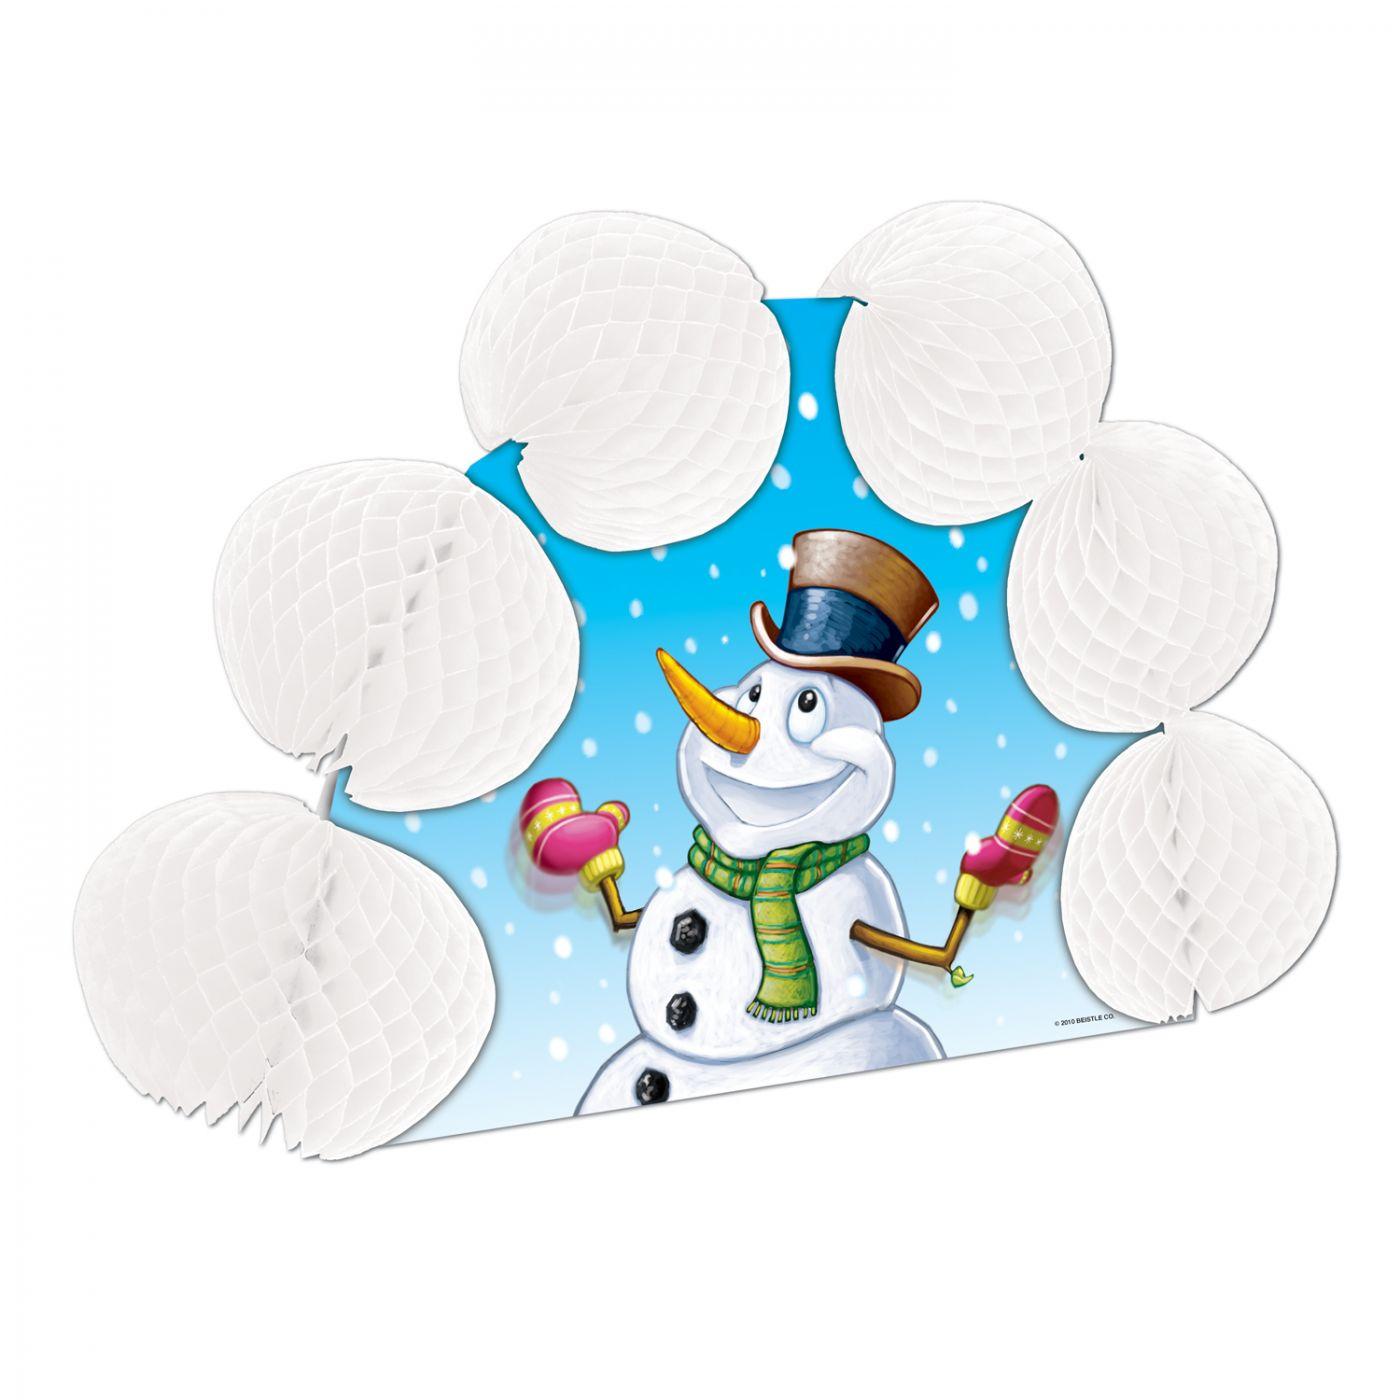 Snowman Pop-Over Centerpiece image